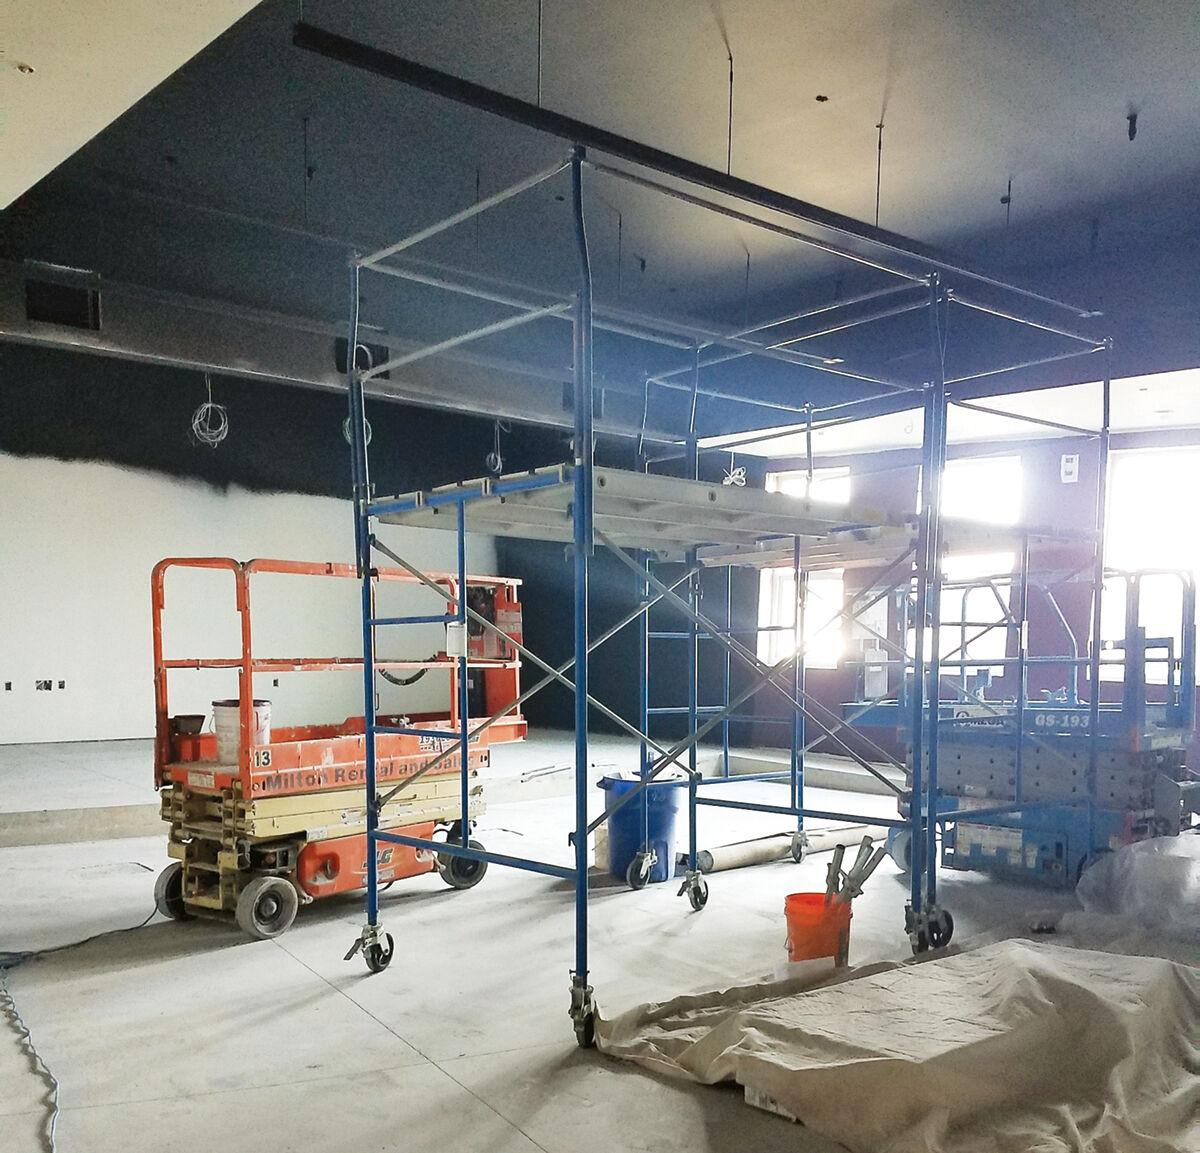 South Burlington Market Street library construction update 2